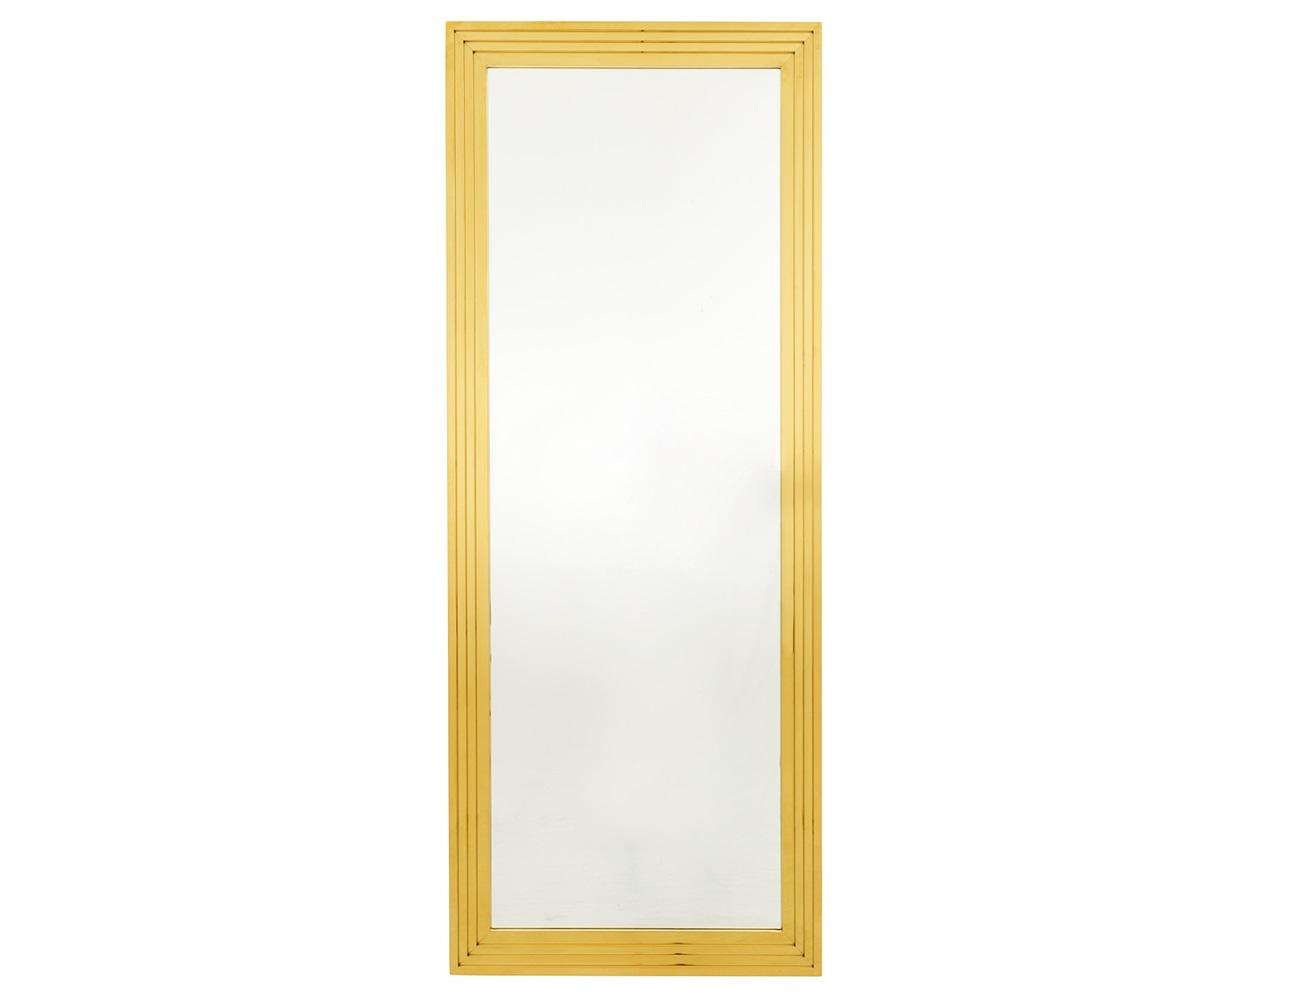 ЗеркалоНастенные зеркала<br>Зеркало Mirror Levine в зеркальной раме золотого цвета.<br><br>Material: Металл<br>Width см: 86<br>Height см: 219